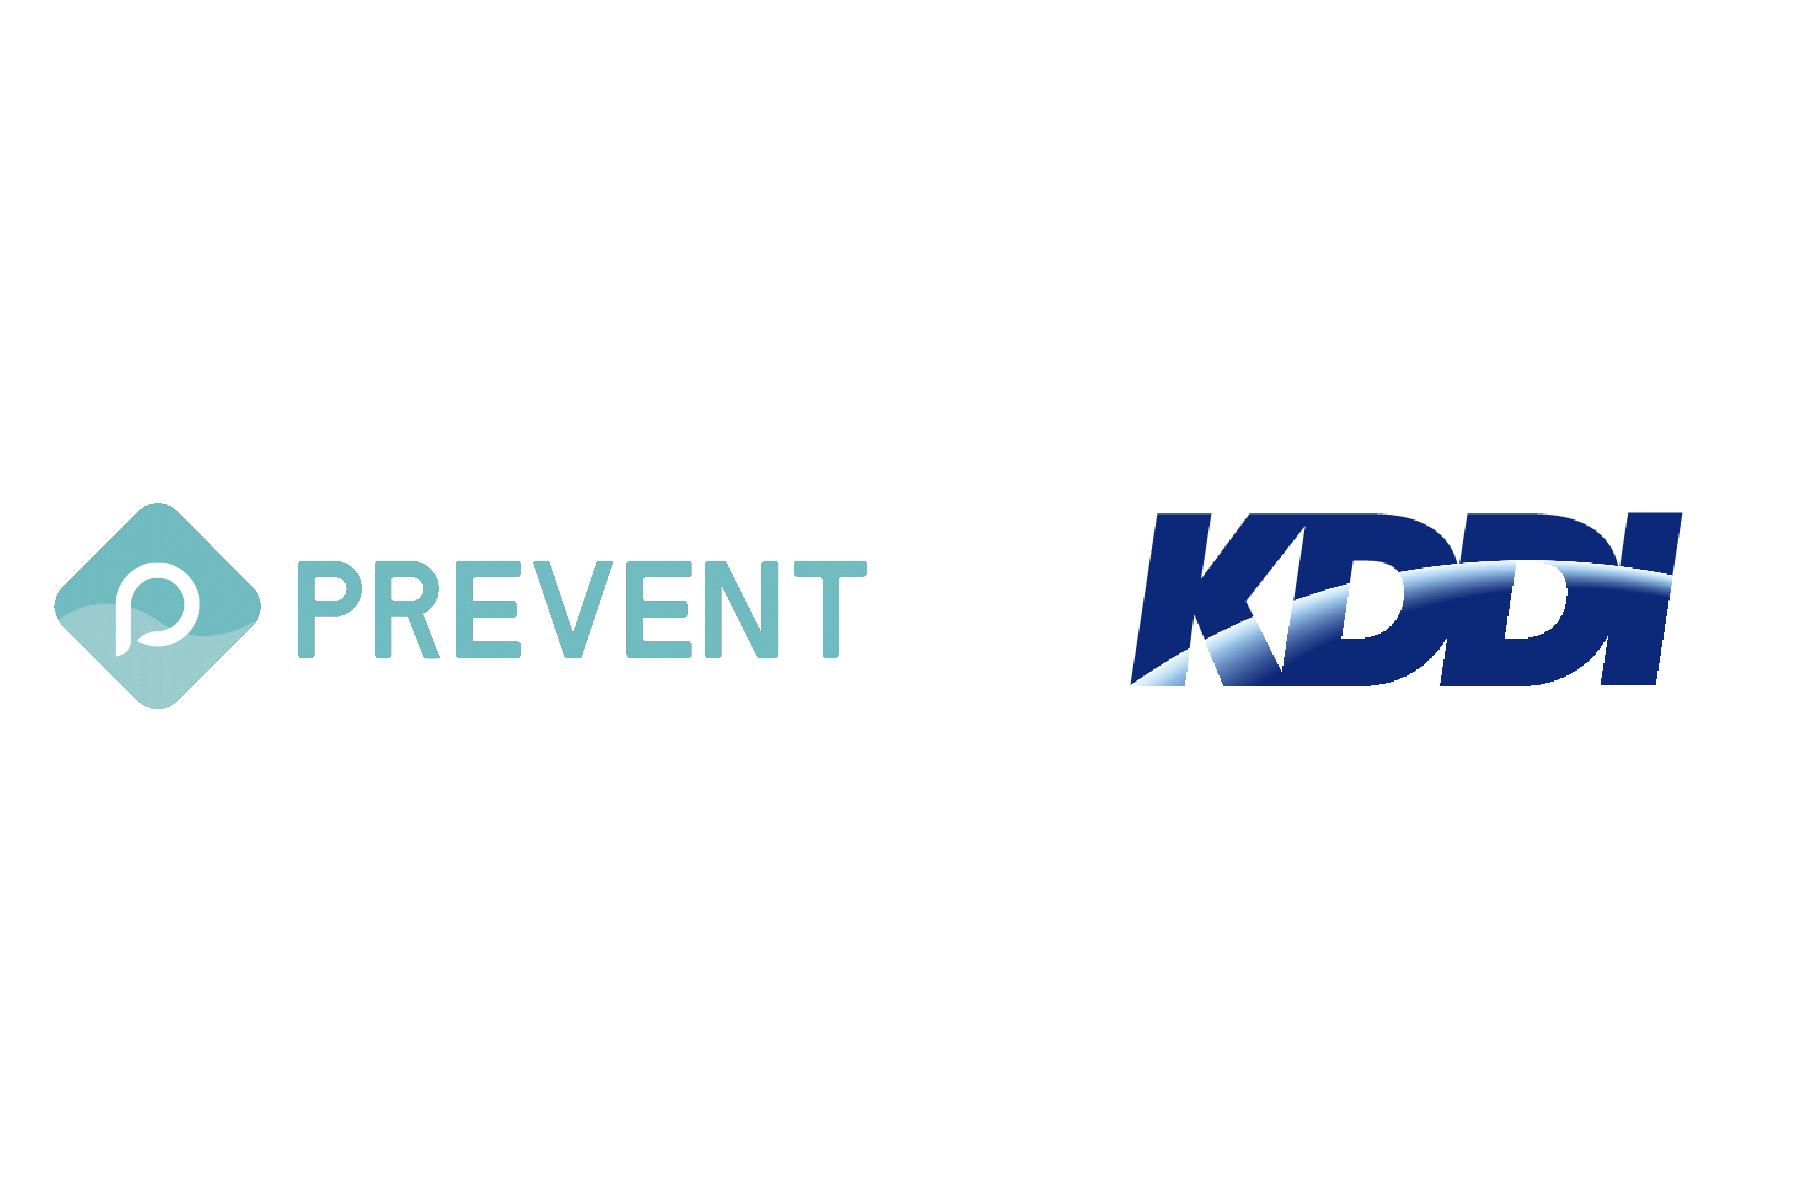 PREVENT×KDDI | 個別化された生活習慣病予防の実現による健康寿命延伸への貢献を目的に業務提携